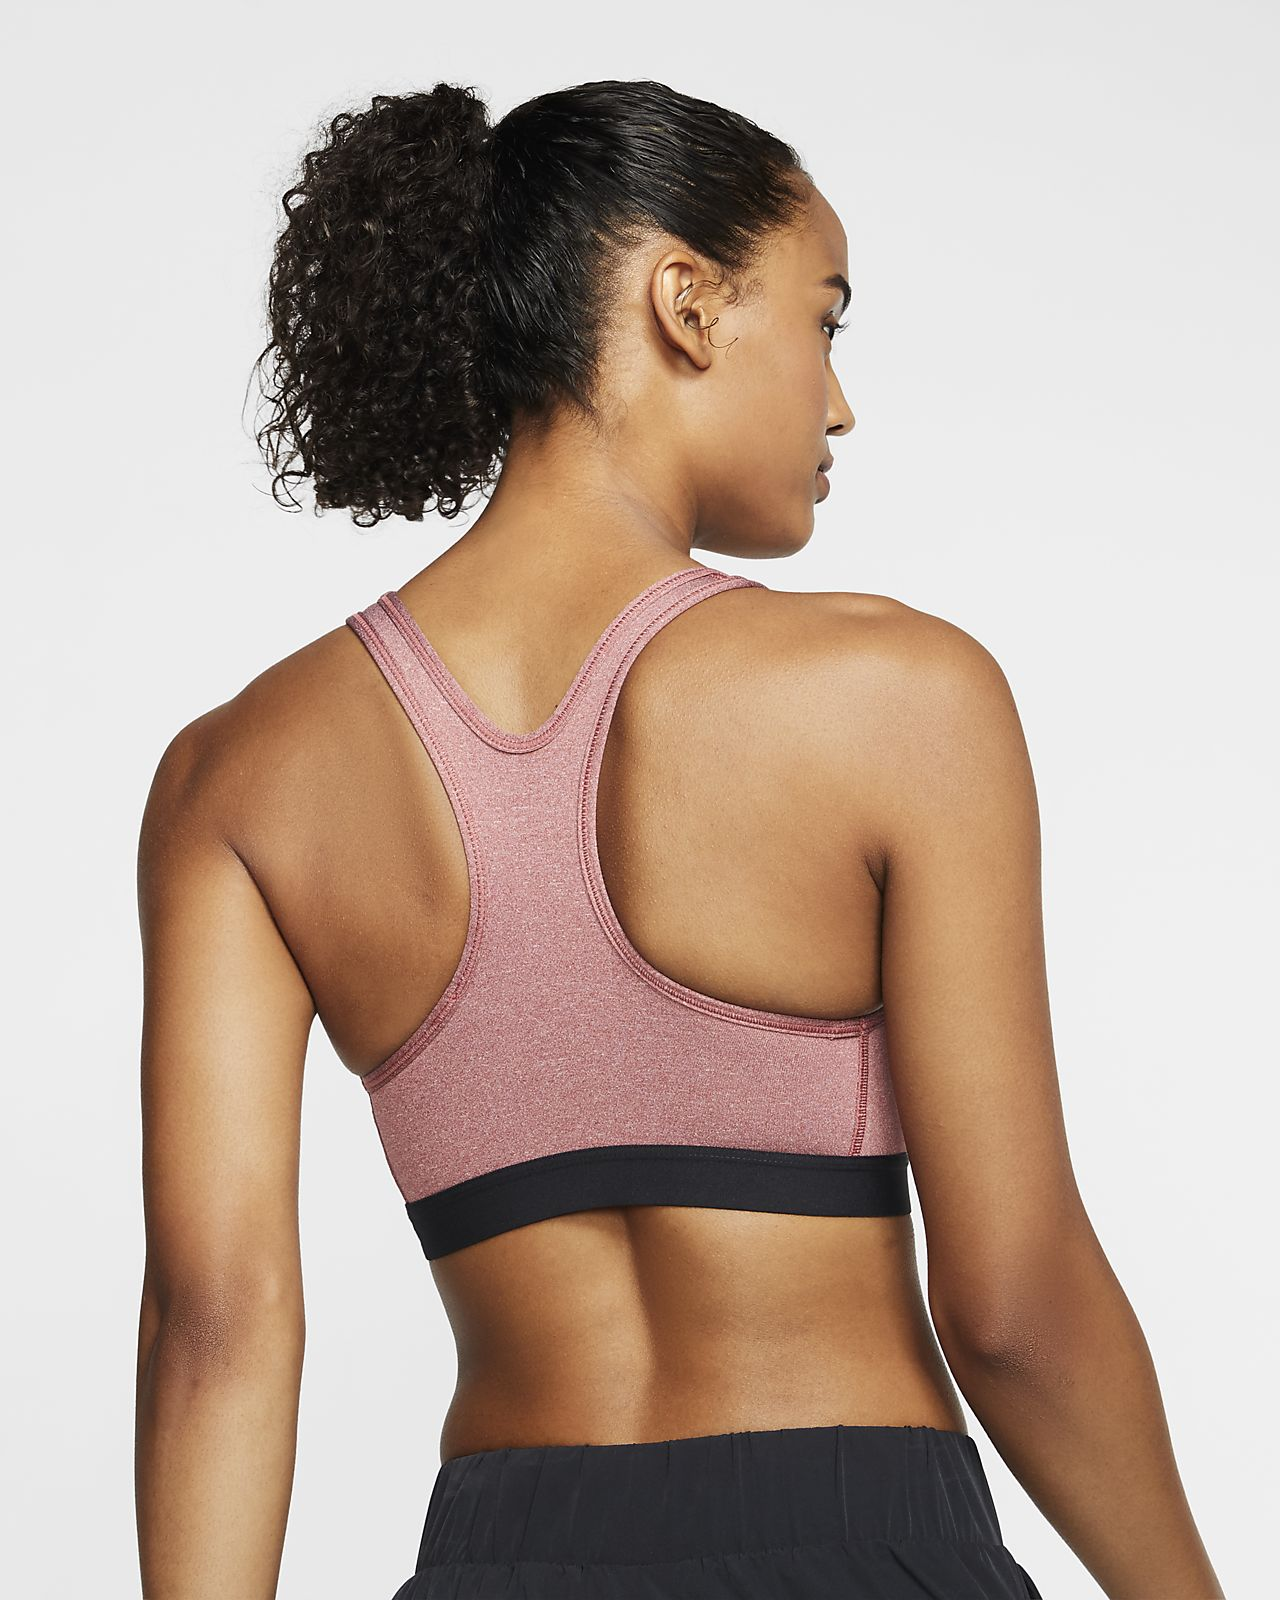 Women's Clothing Nike Victory Graphic Medium-Impact Sports Bra Black XS